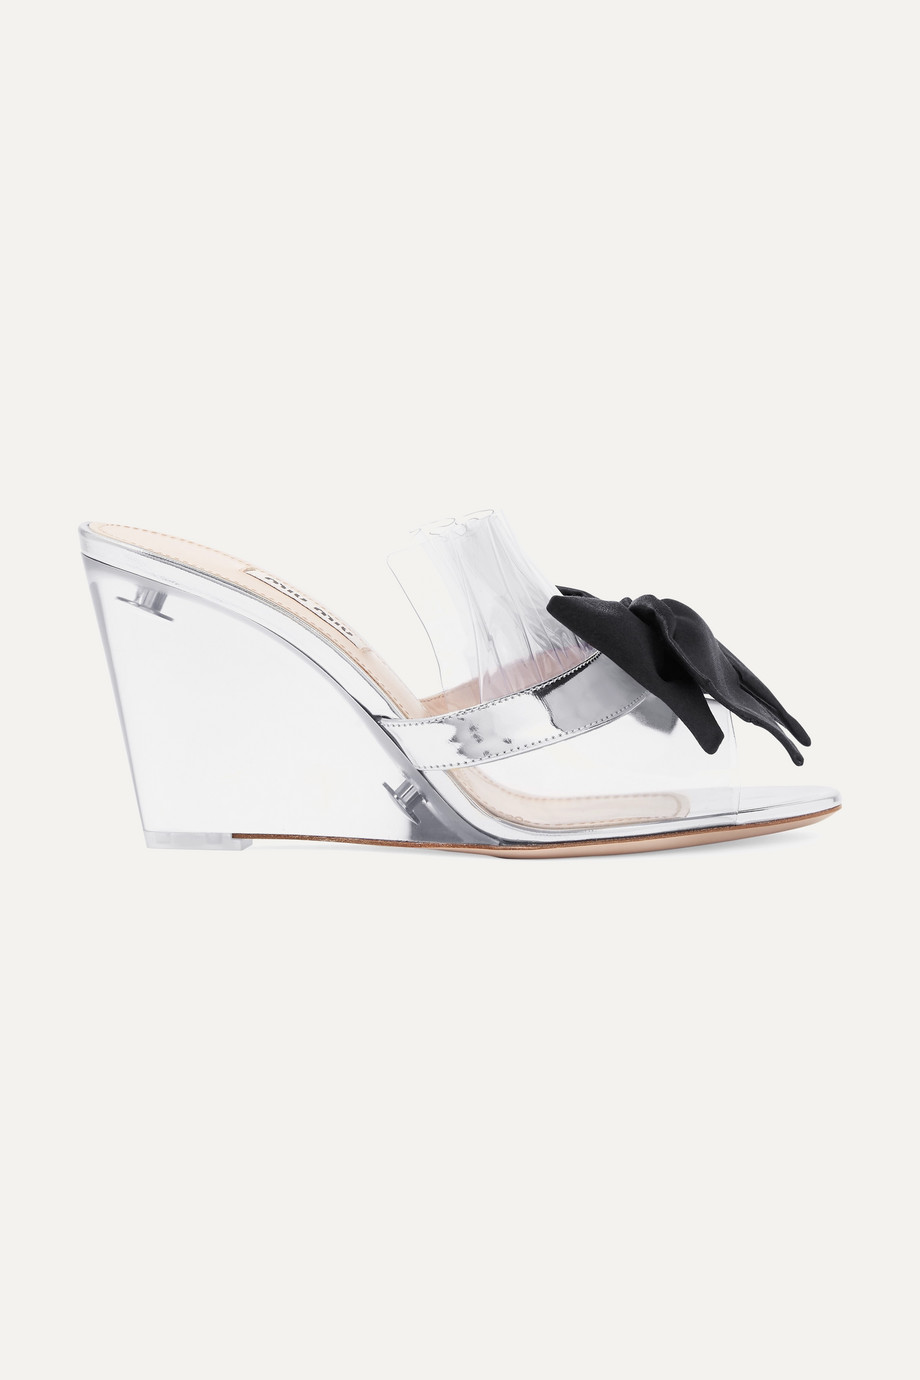 Miu Miu Bow-embellished Perspex and metallic leather wedge sandals